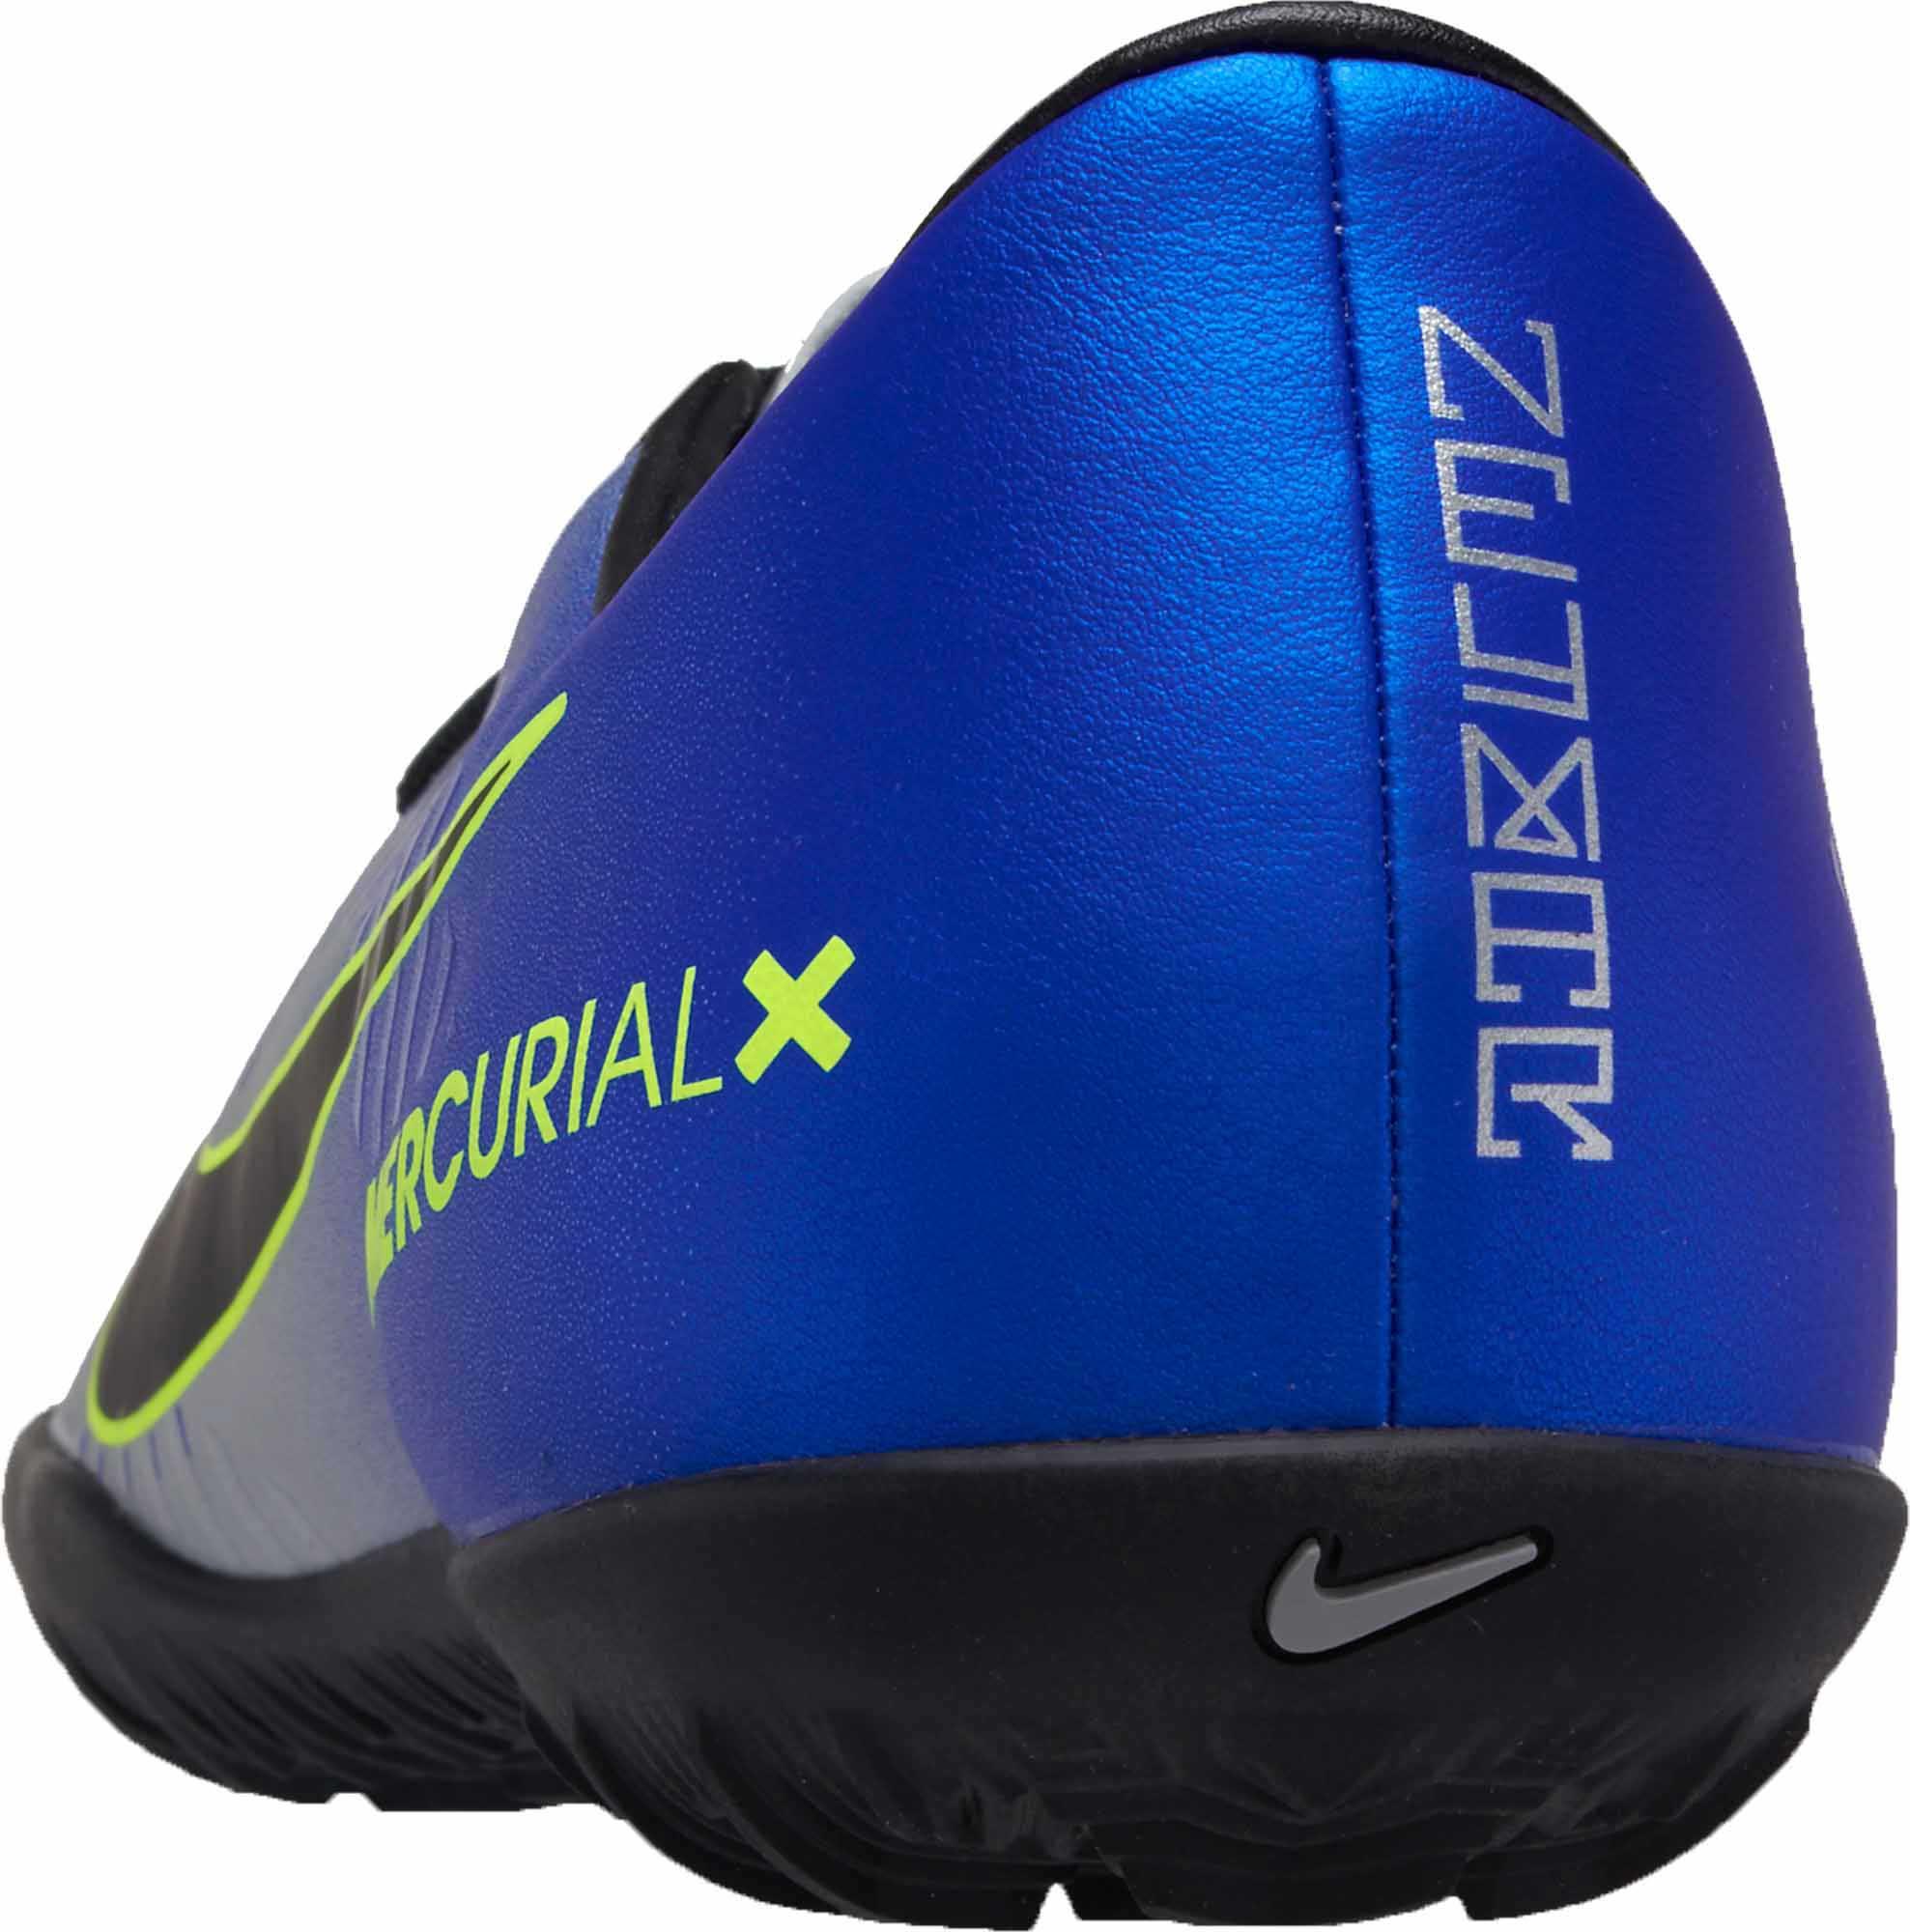 buy online 519e9 be6d7 Nike MercurialX Victory VI TF – Neymar Jr – Racer Blue Chrome